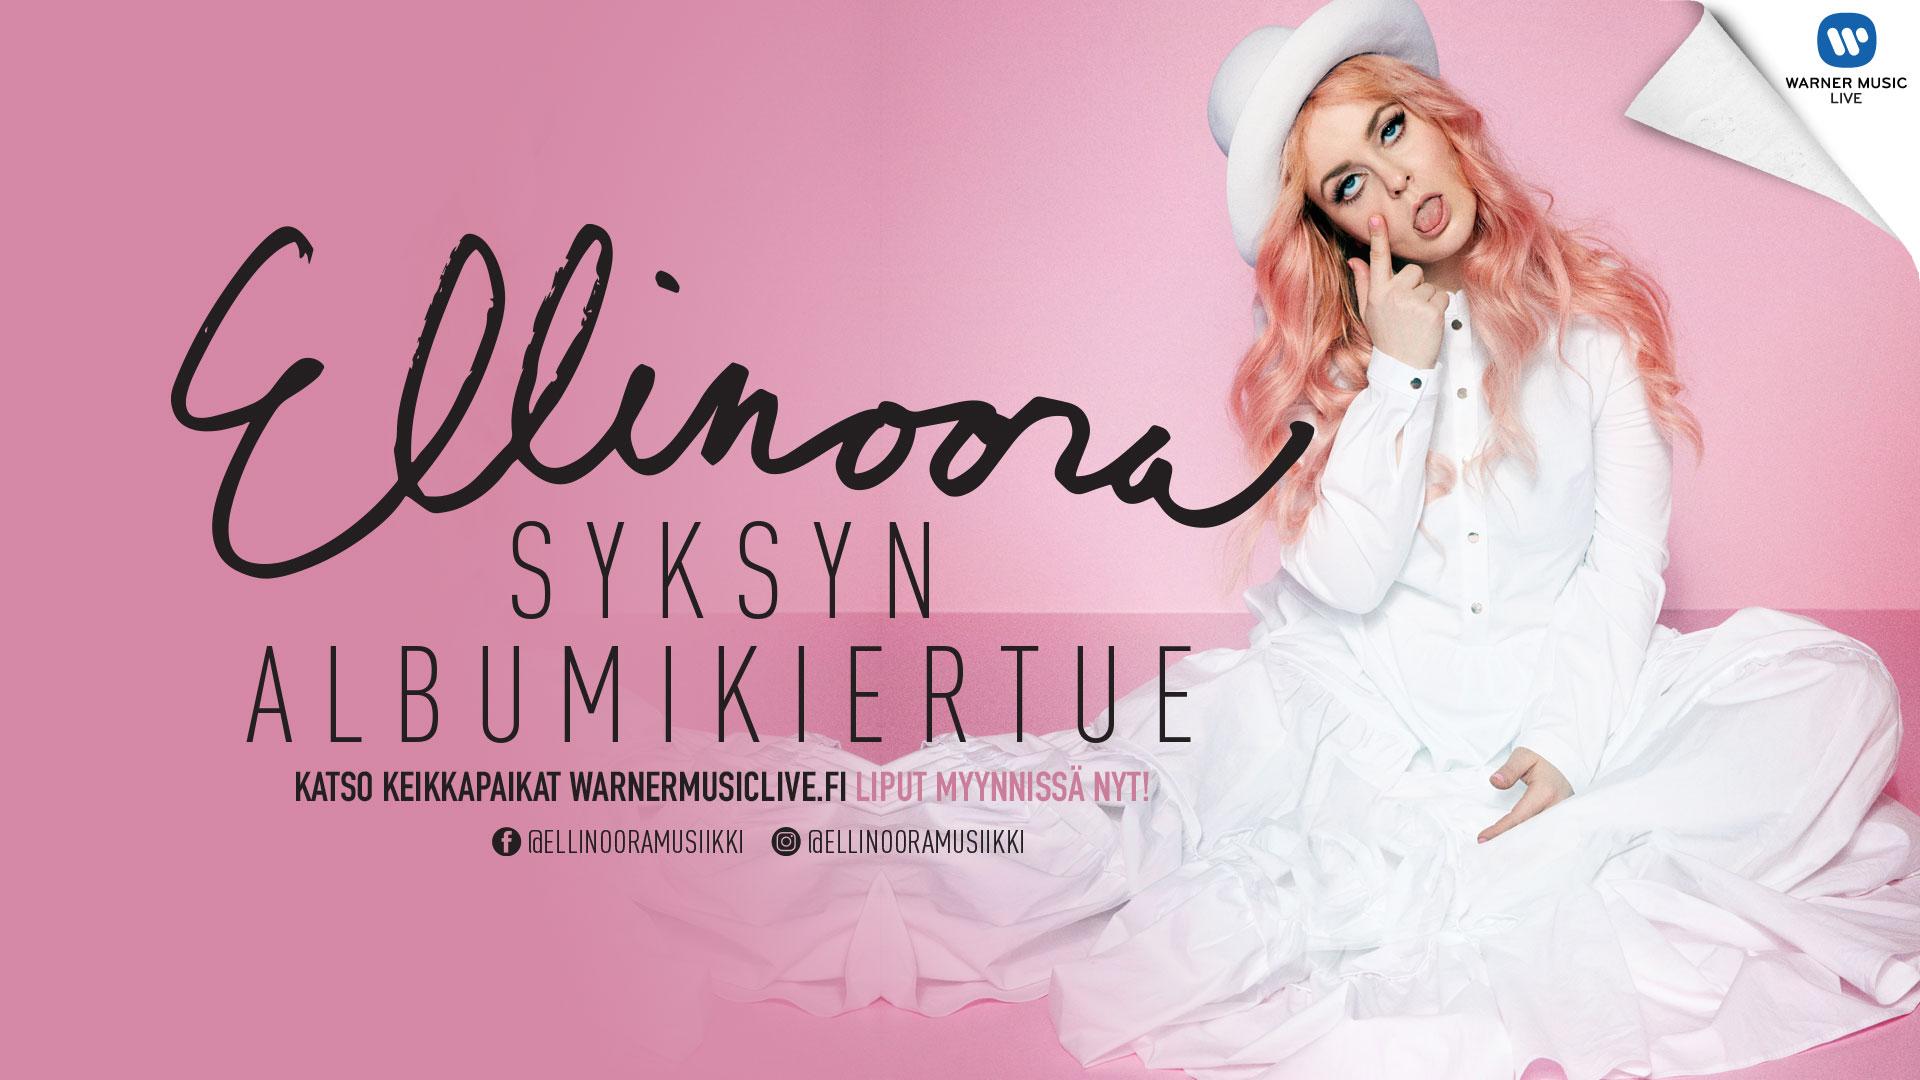 Link to event Ellinoora